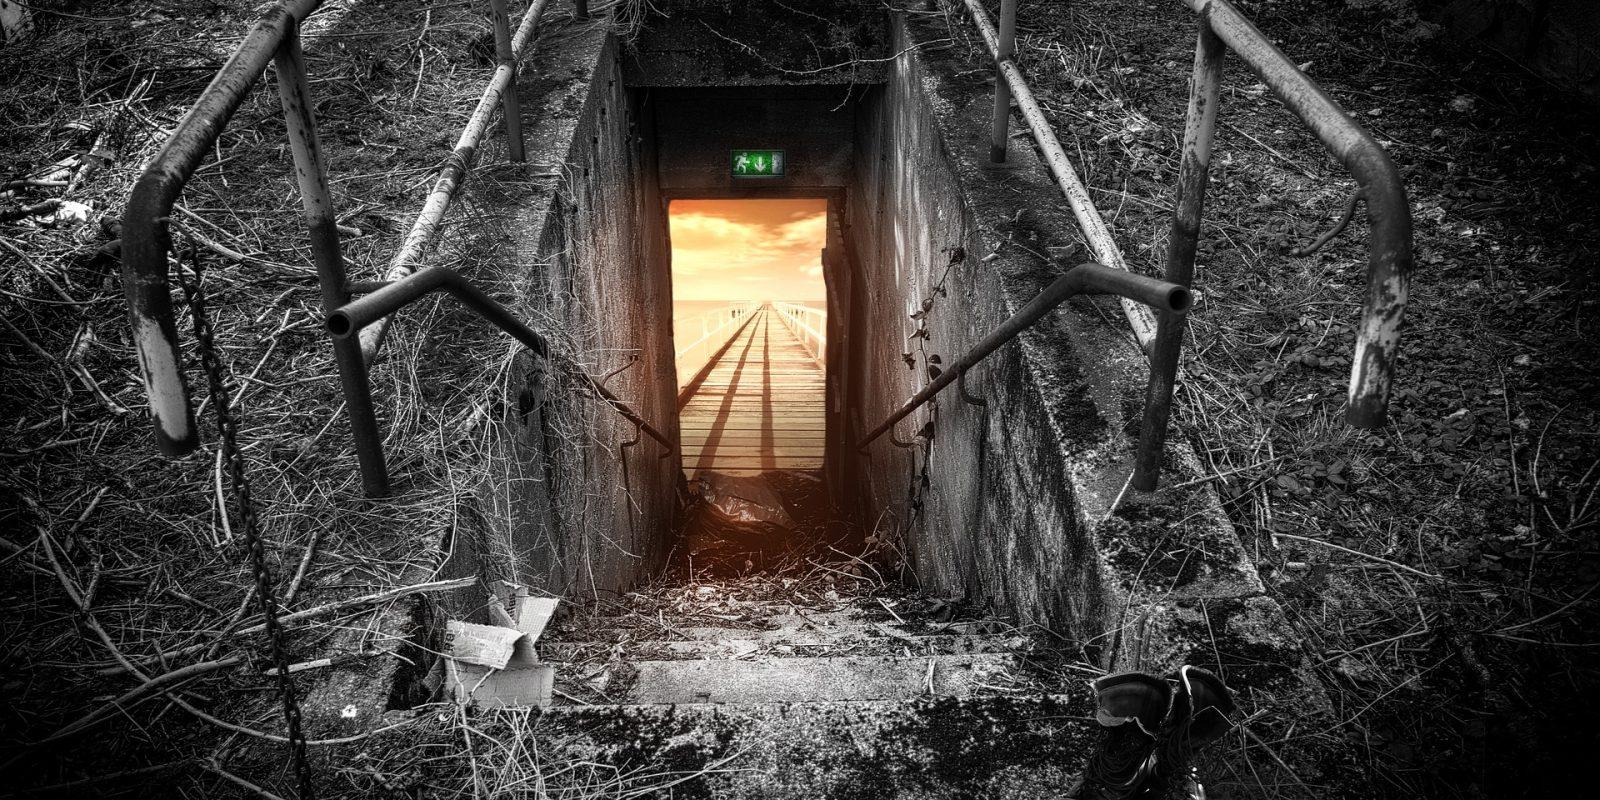 emergency-exit-696656_1920 - Andreas Riedelmeier de Pixabay